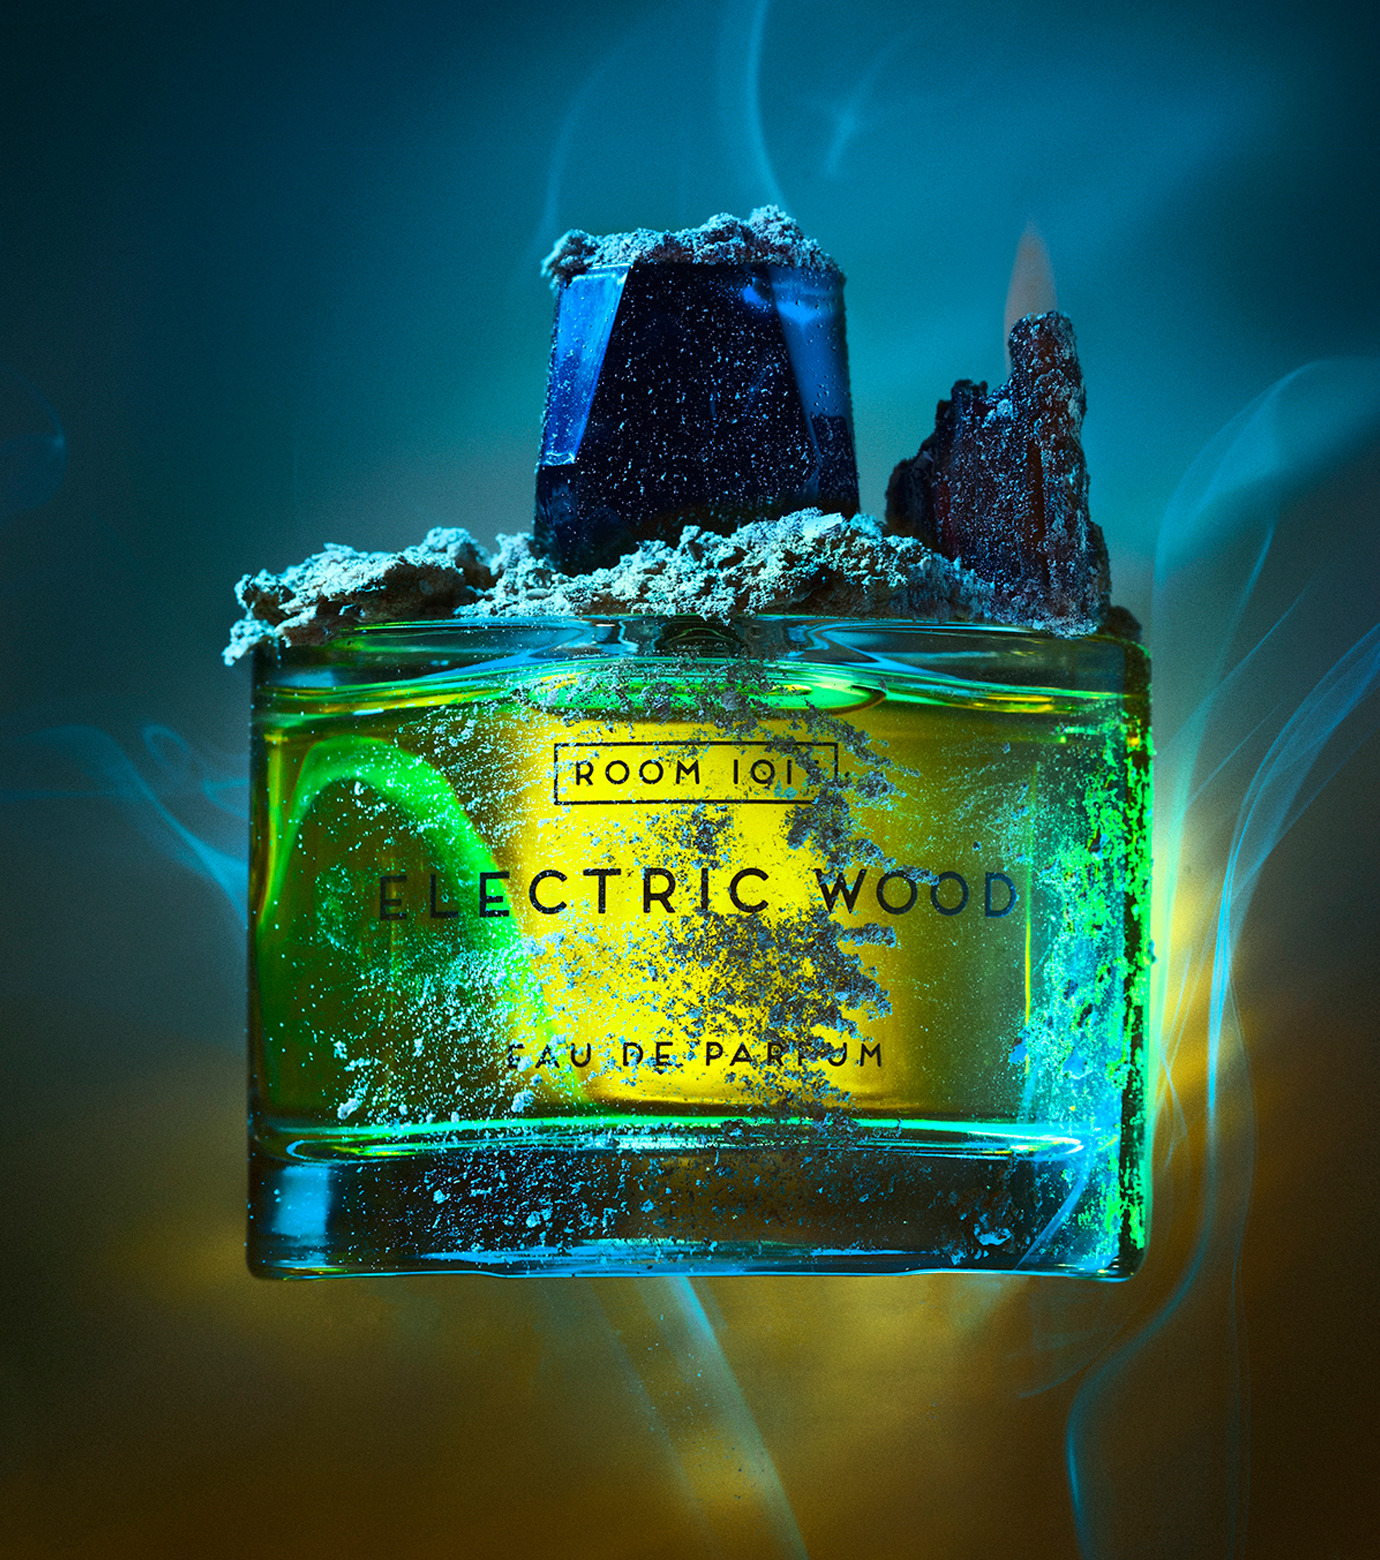 ROOM1015()のElectric Wood eau de parfum-WHITE(FRAGRANCE-GROOMING/フレグランス/FRAGRANCE-GROOMING/fragrance)-102FR-EW0124-4 拡大詳細画像4